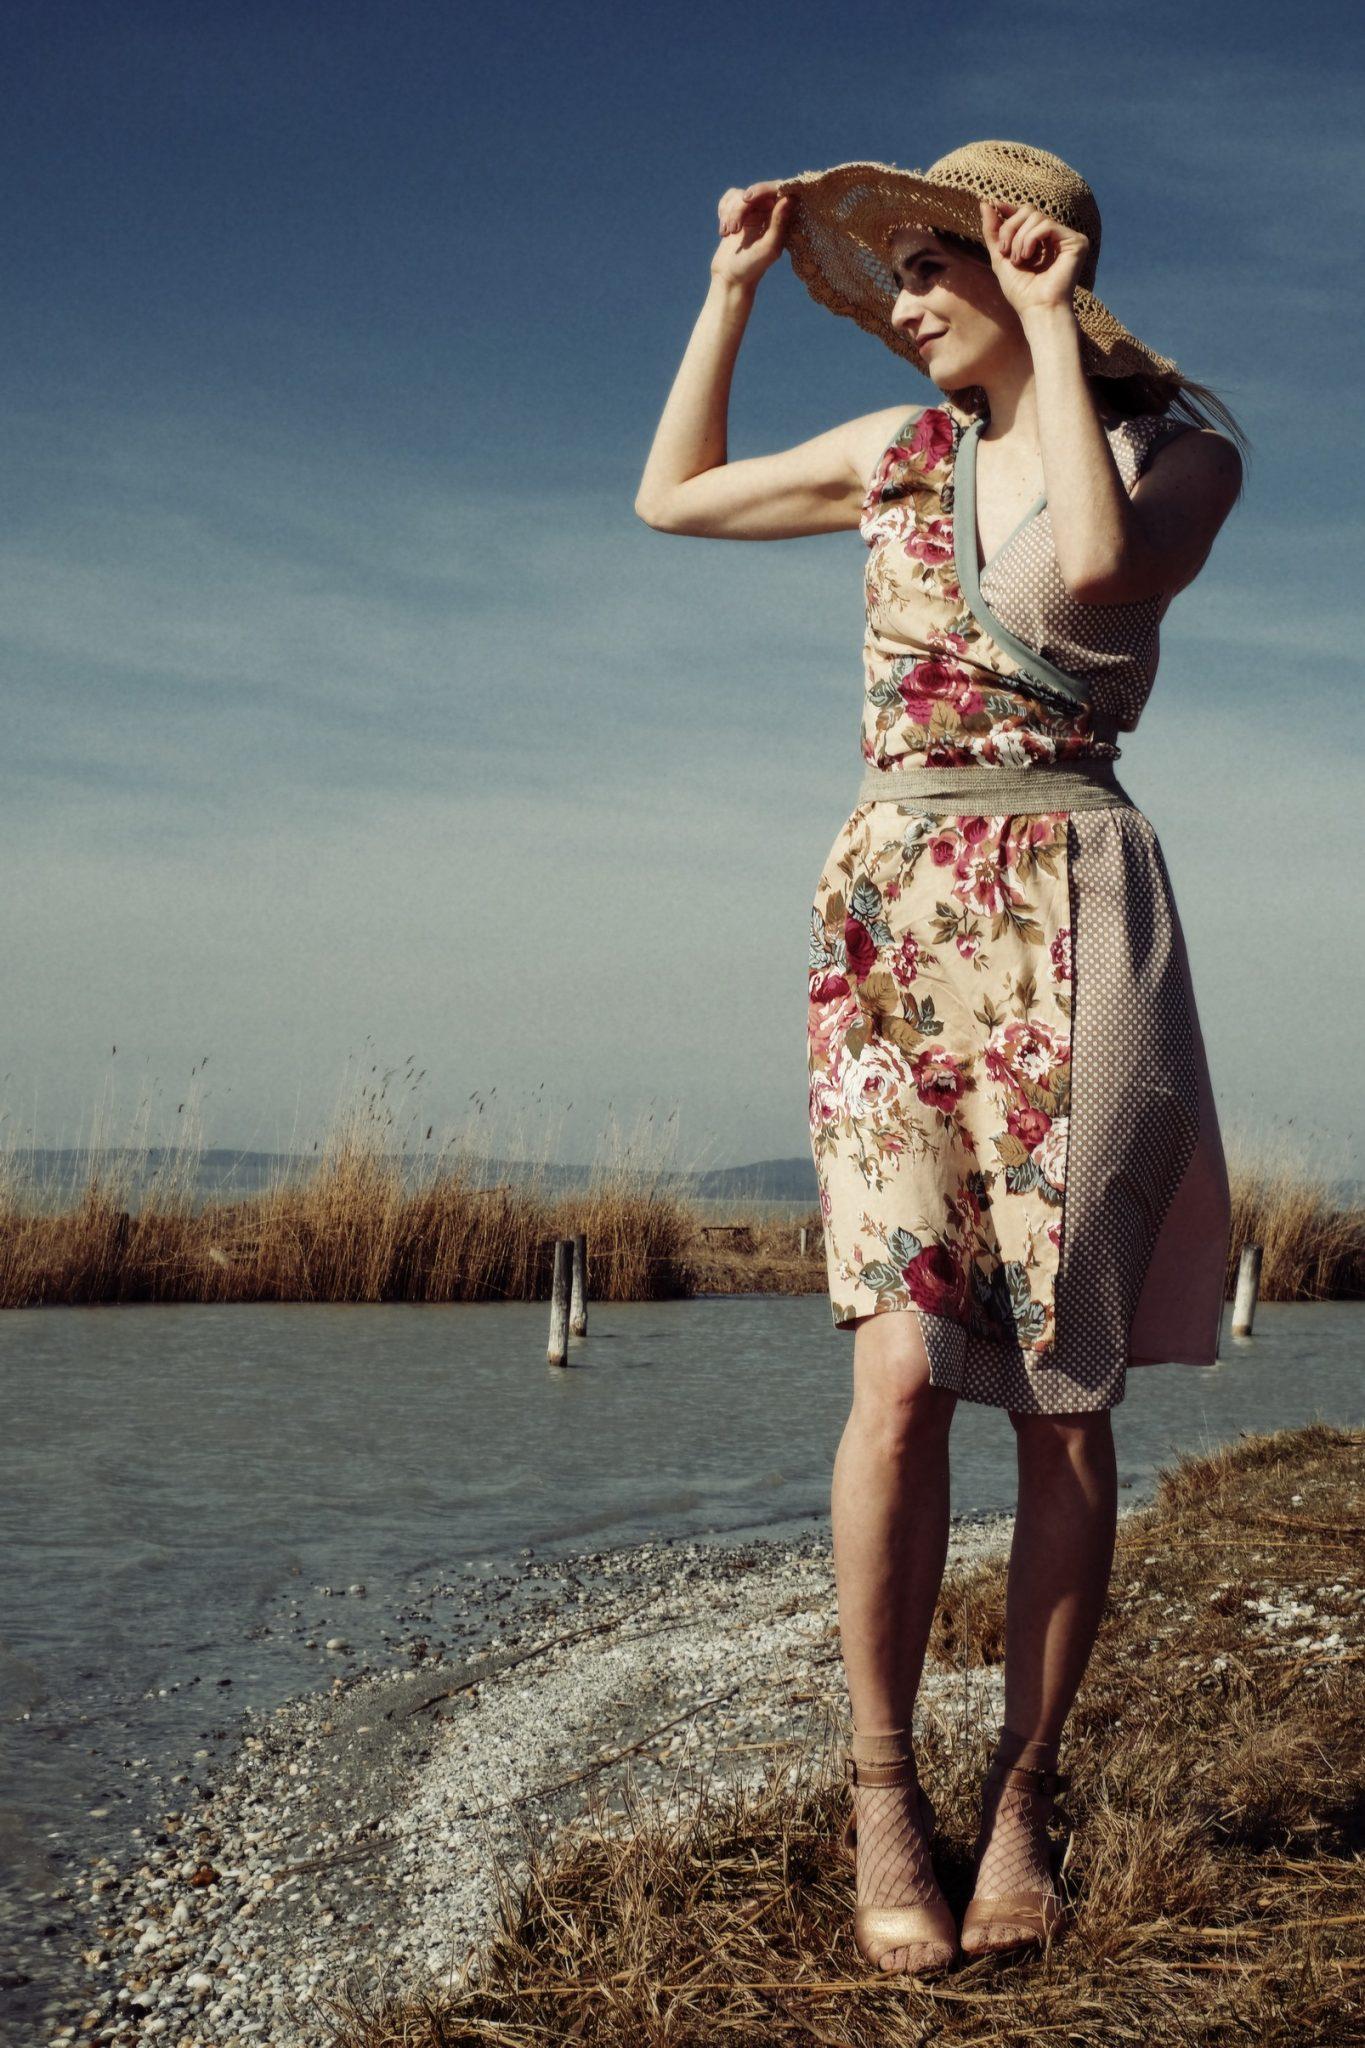 Wienerkleid Spring 19 by Steve Haider (44)_resize